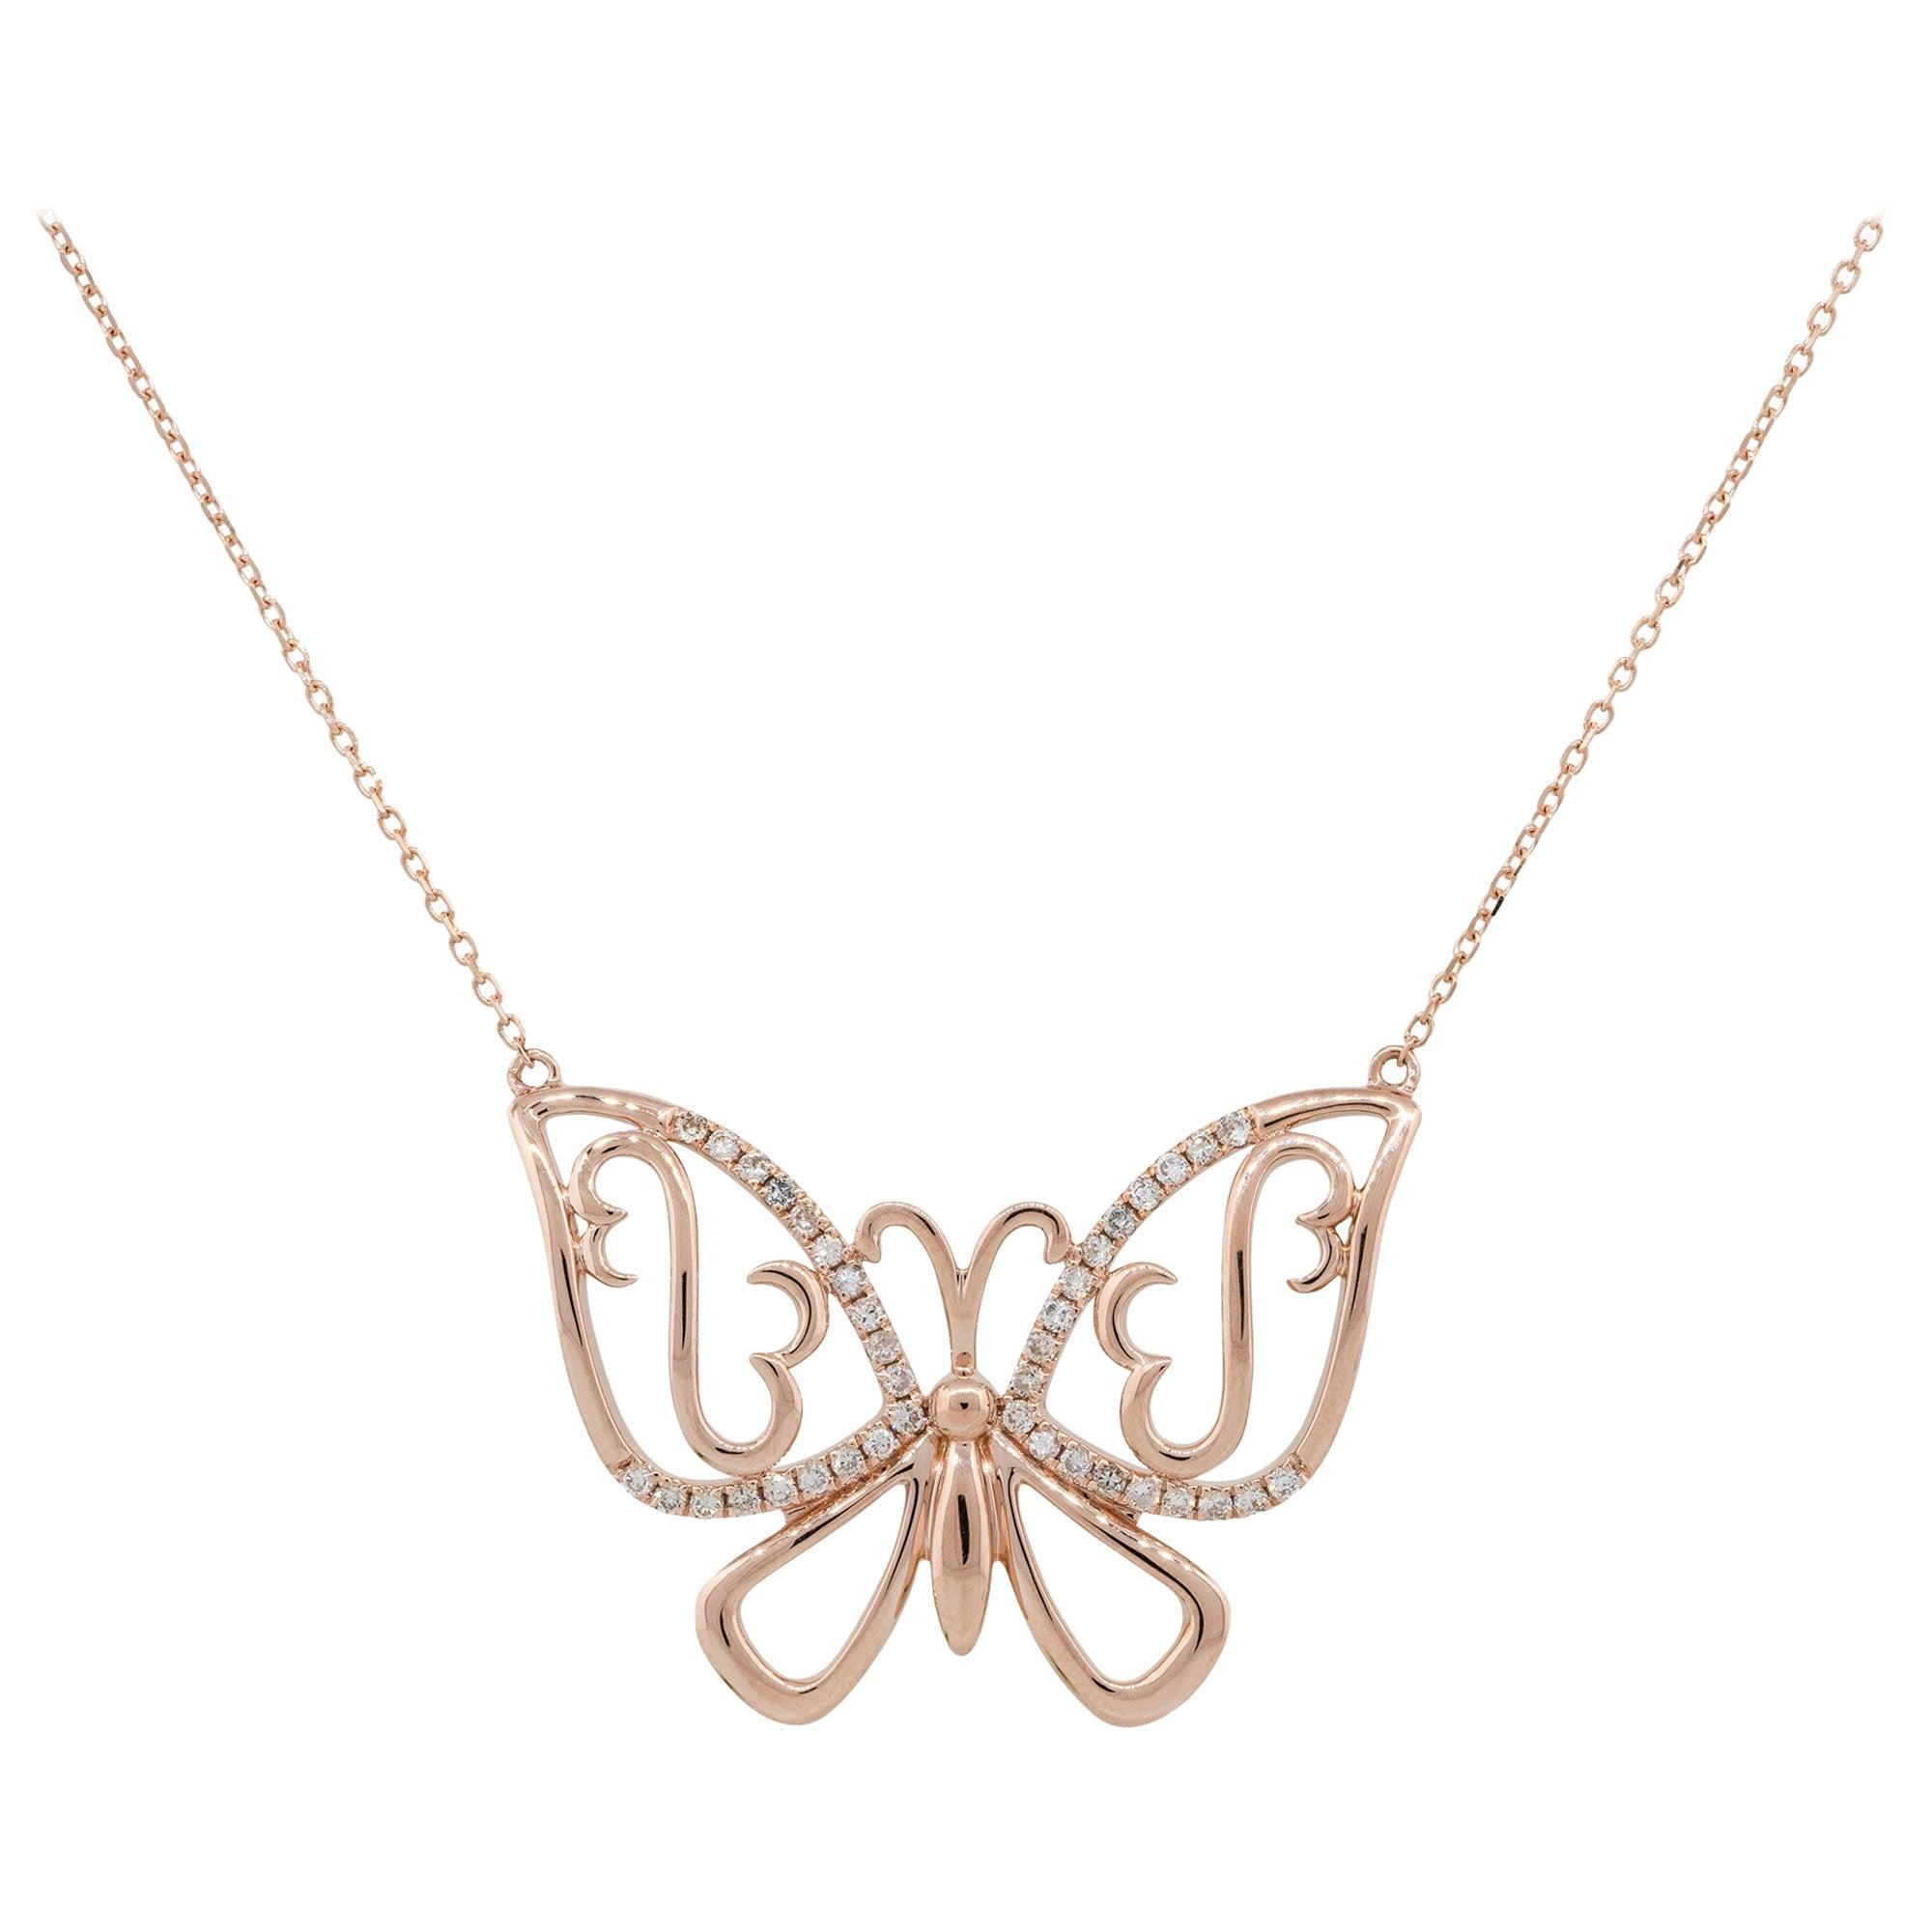 0.25 Carat Diamond Butterfly Pendant Necklace 14 Karat in Stock